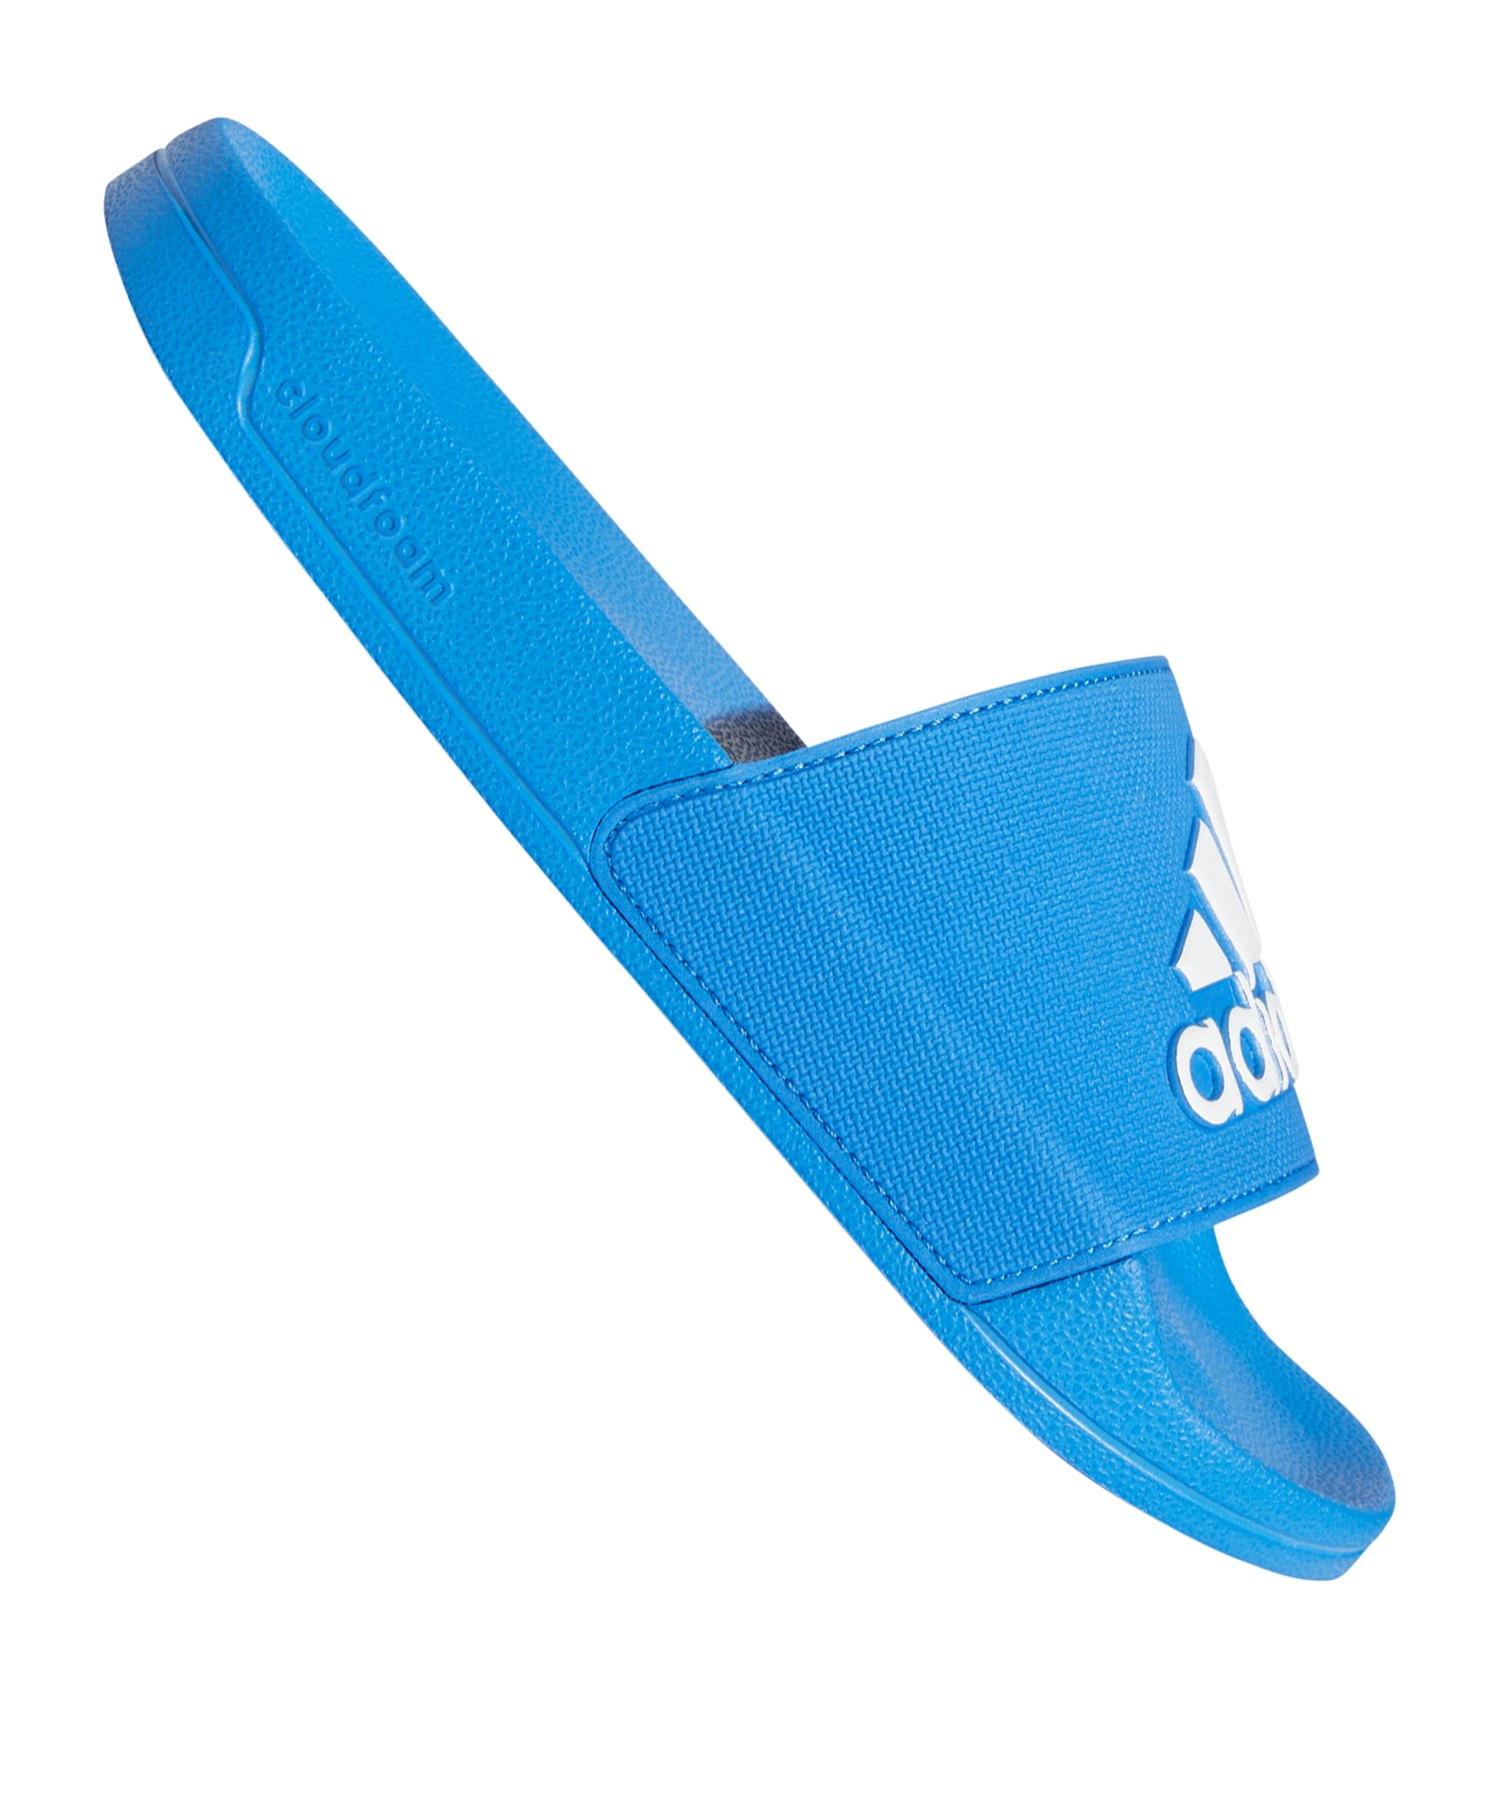 adidas Adilette Shower Badelatsche Blau Weiss - blau